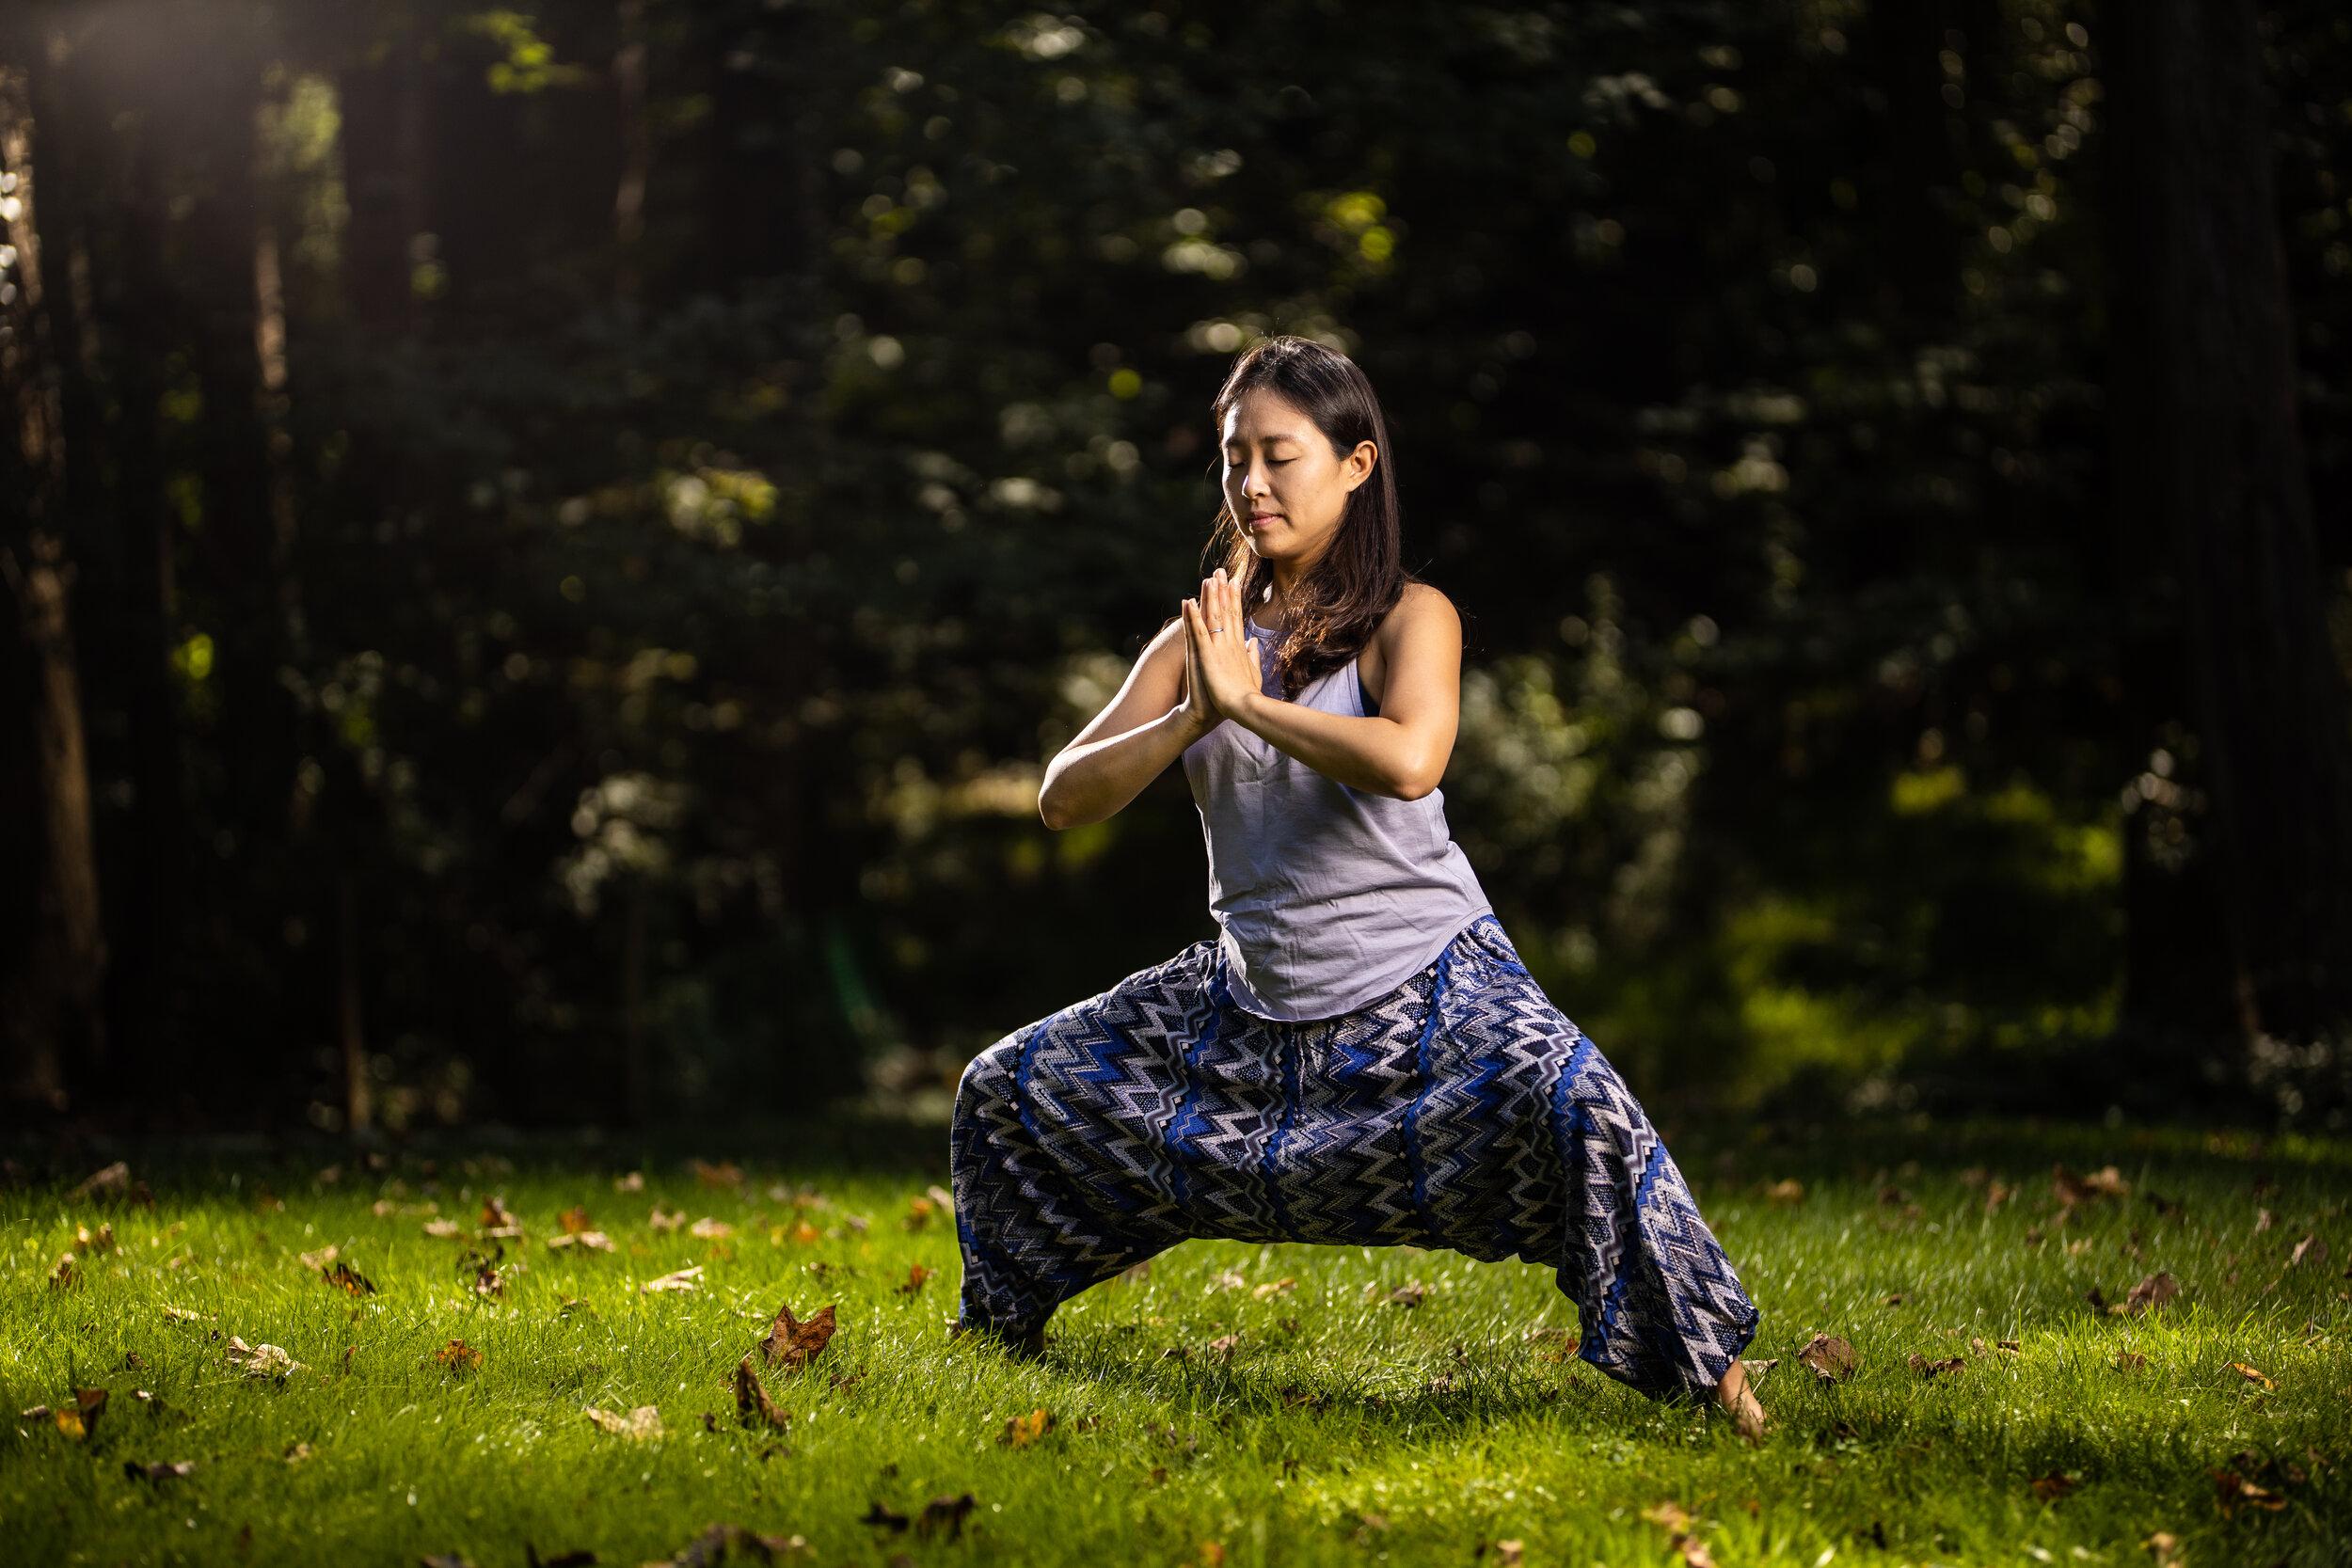 Minjung Seo, Prenatel Yoga teacher at Easy Day Yoga in Ashburn, Va